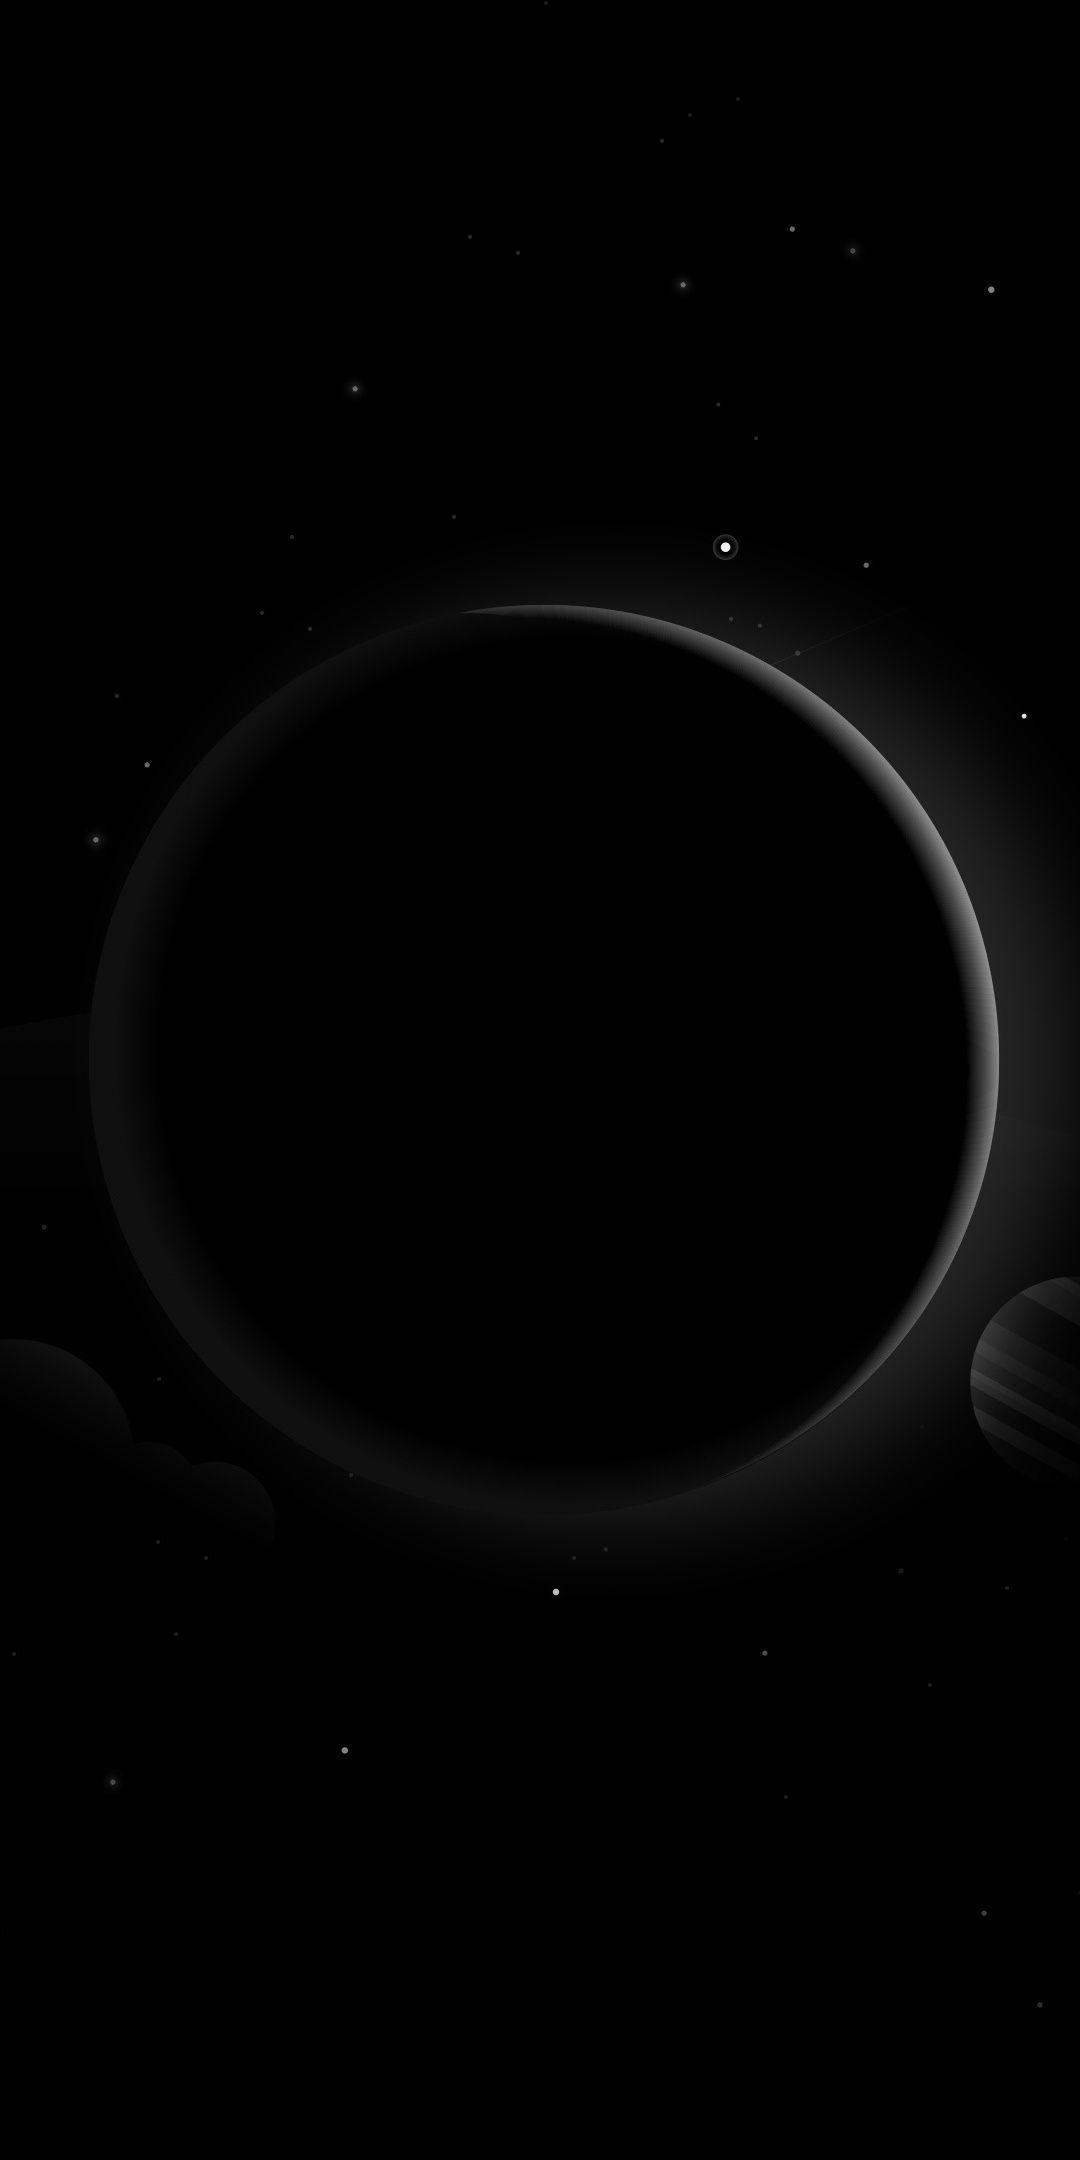 Space Dark Planets Abstract 1080x2160 Wallpaper Dark Wallpaper Iphone Black Hd Wallpaper Phone Wallpaper